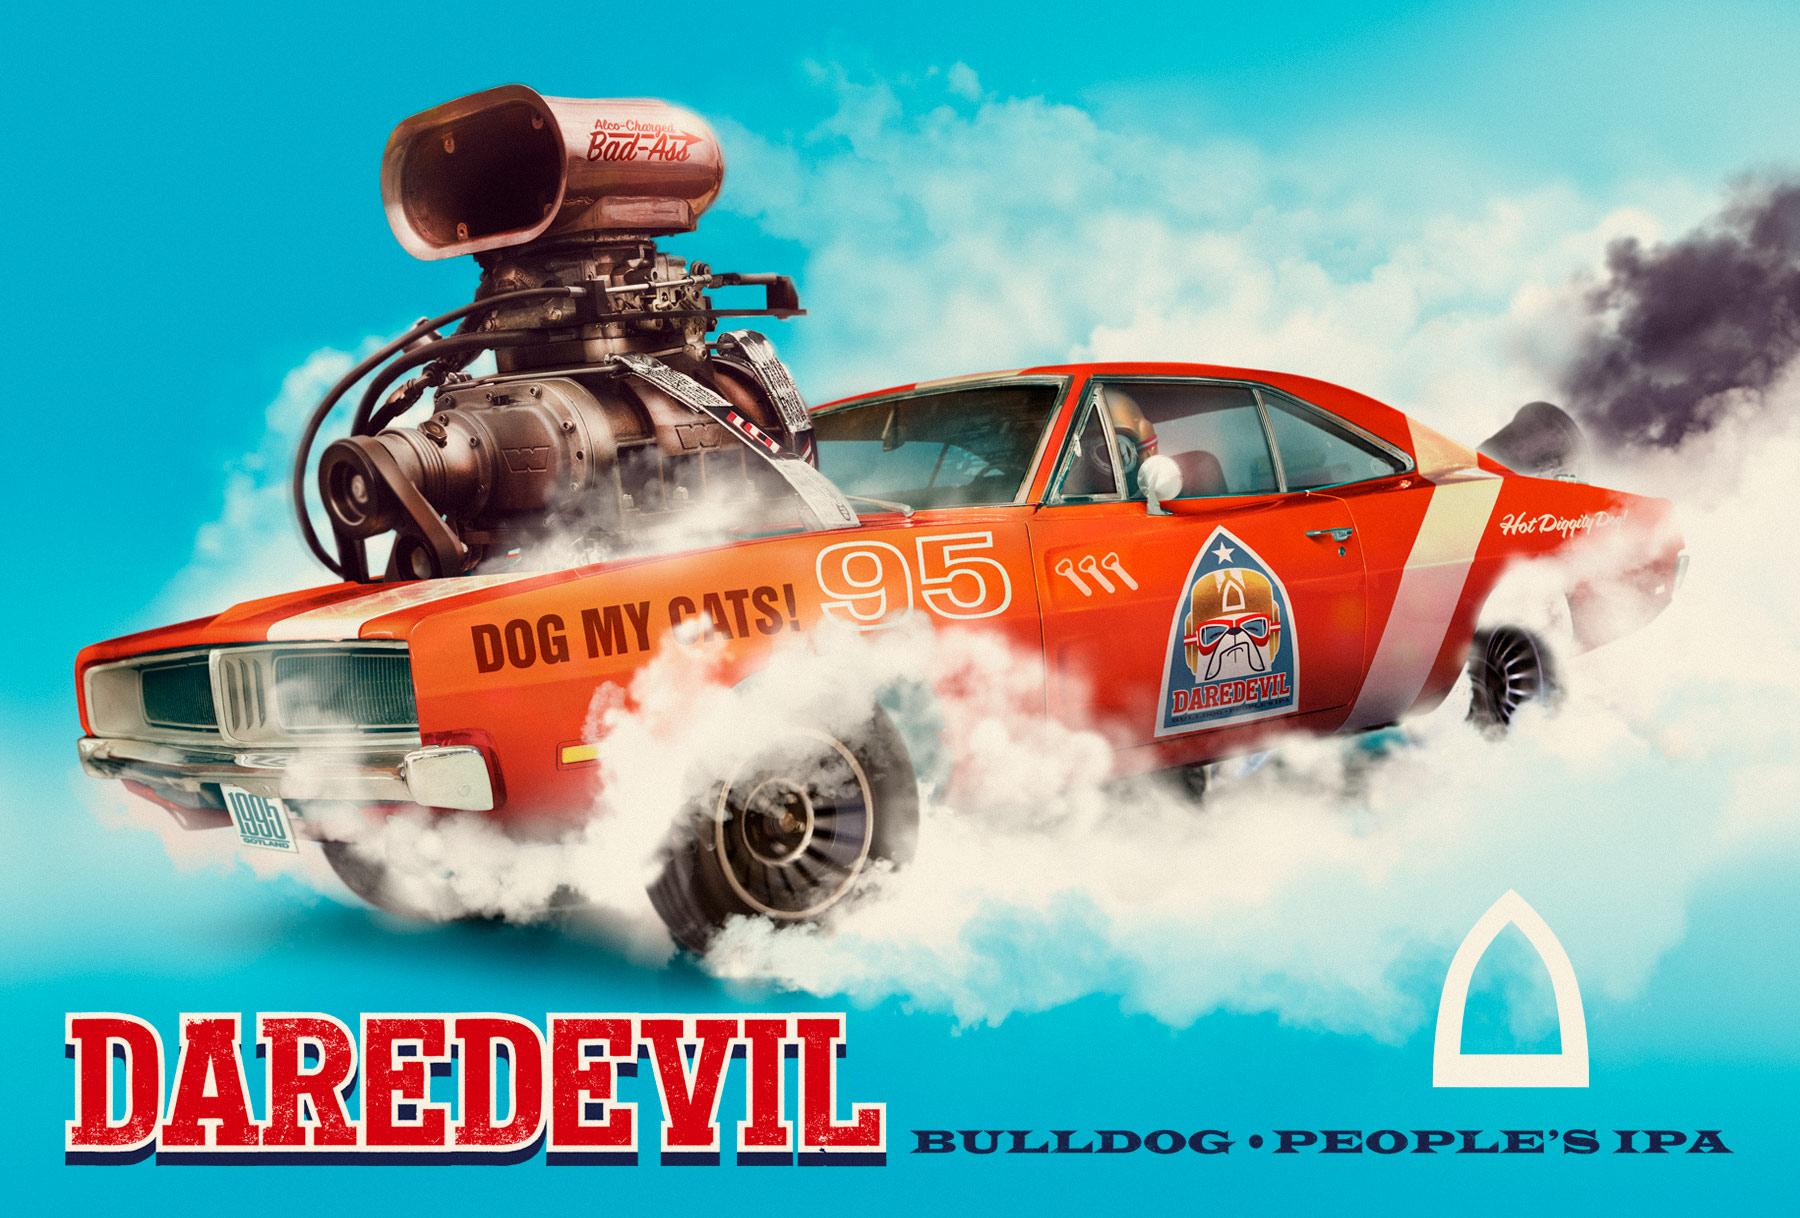 Daredevil IPA designed by Problem Bob